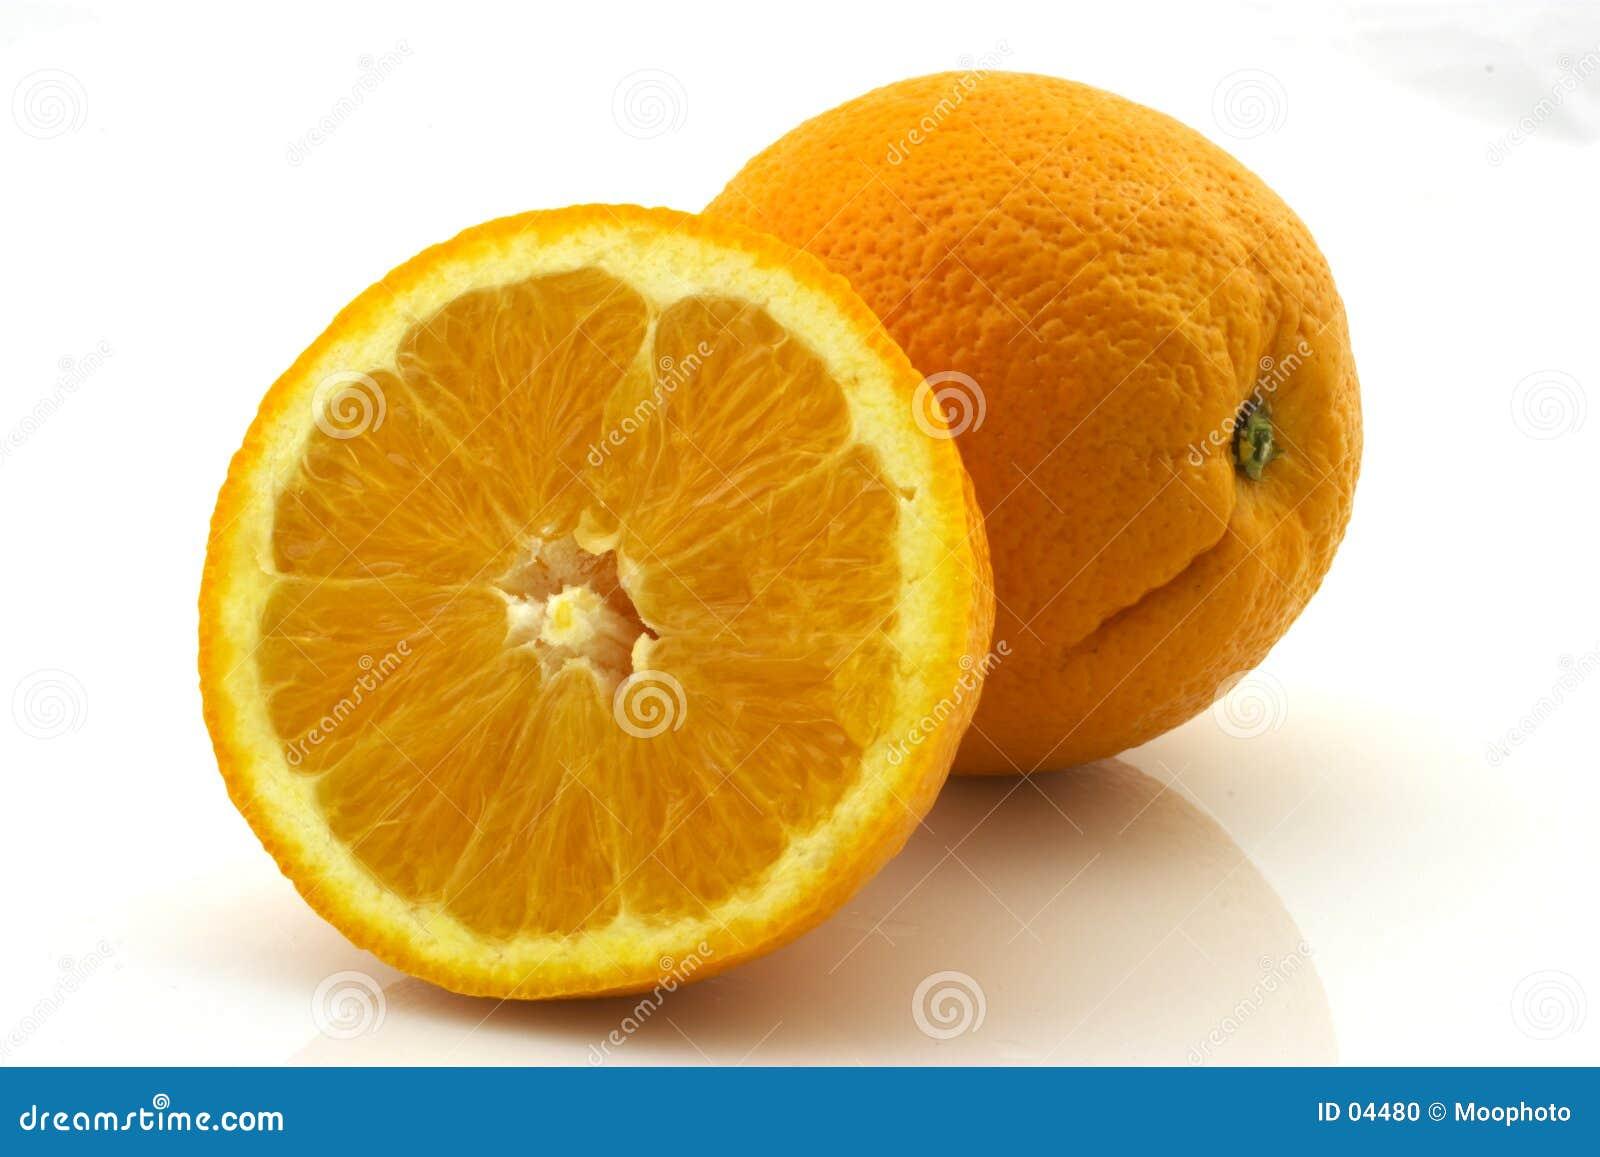 Orange and a half